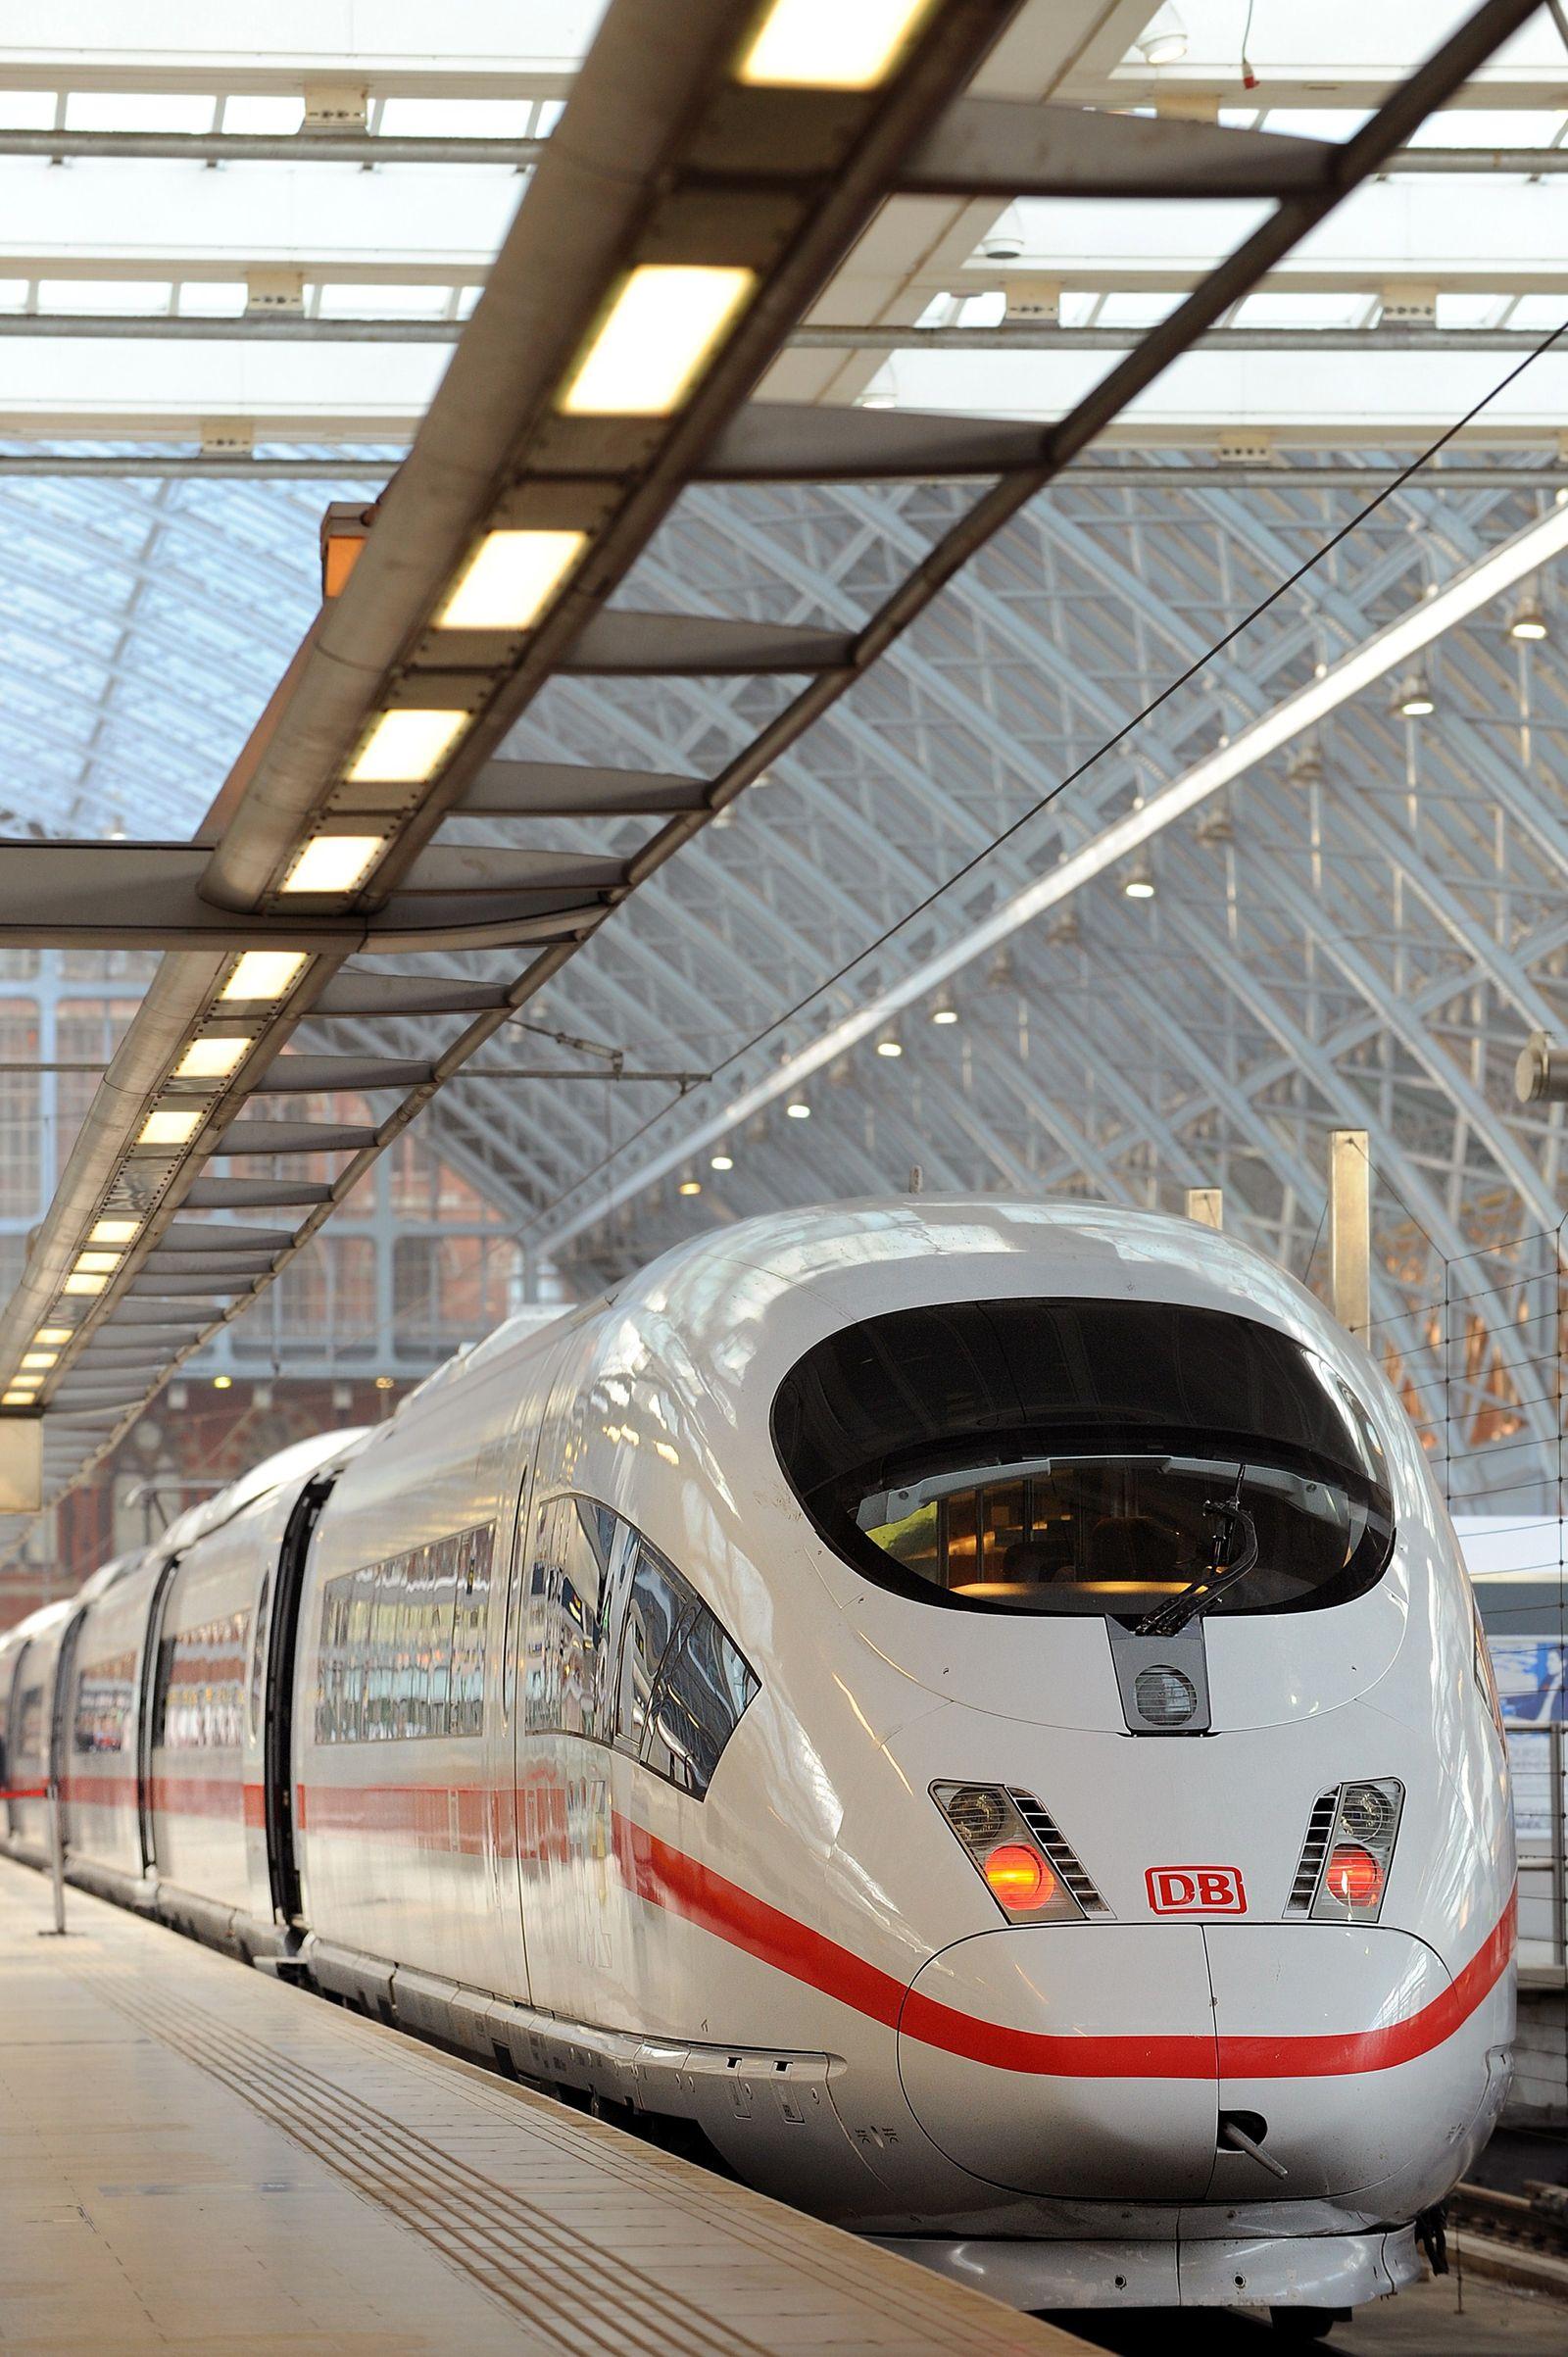 BRITAIN-GERMANY-FRANCE-TRANSPORT-RAIL